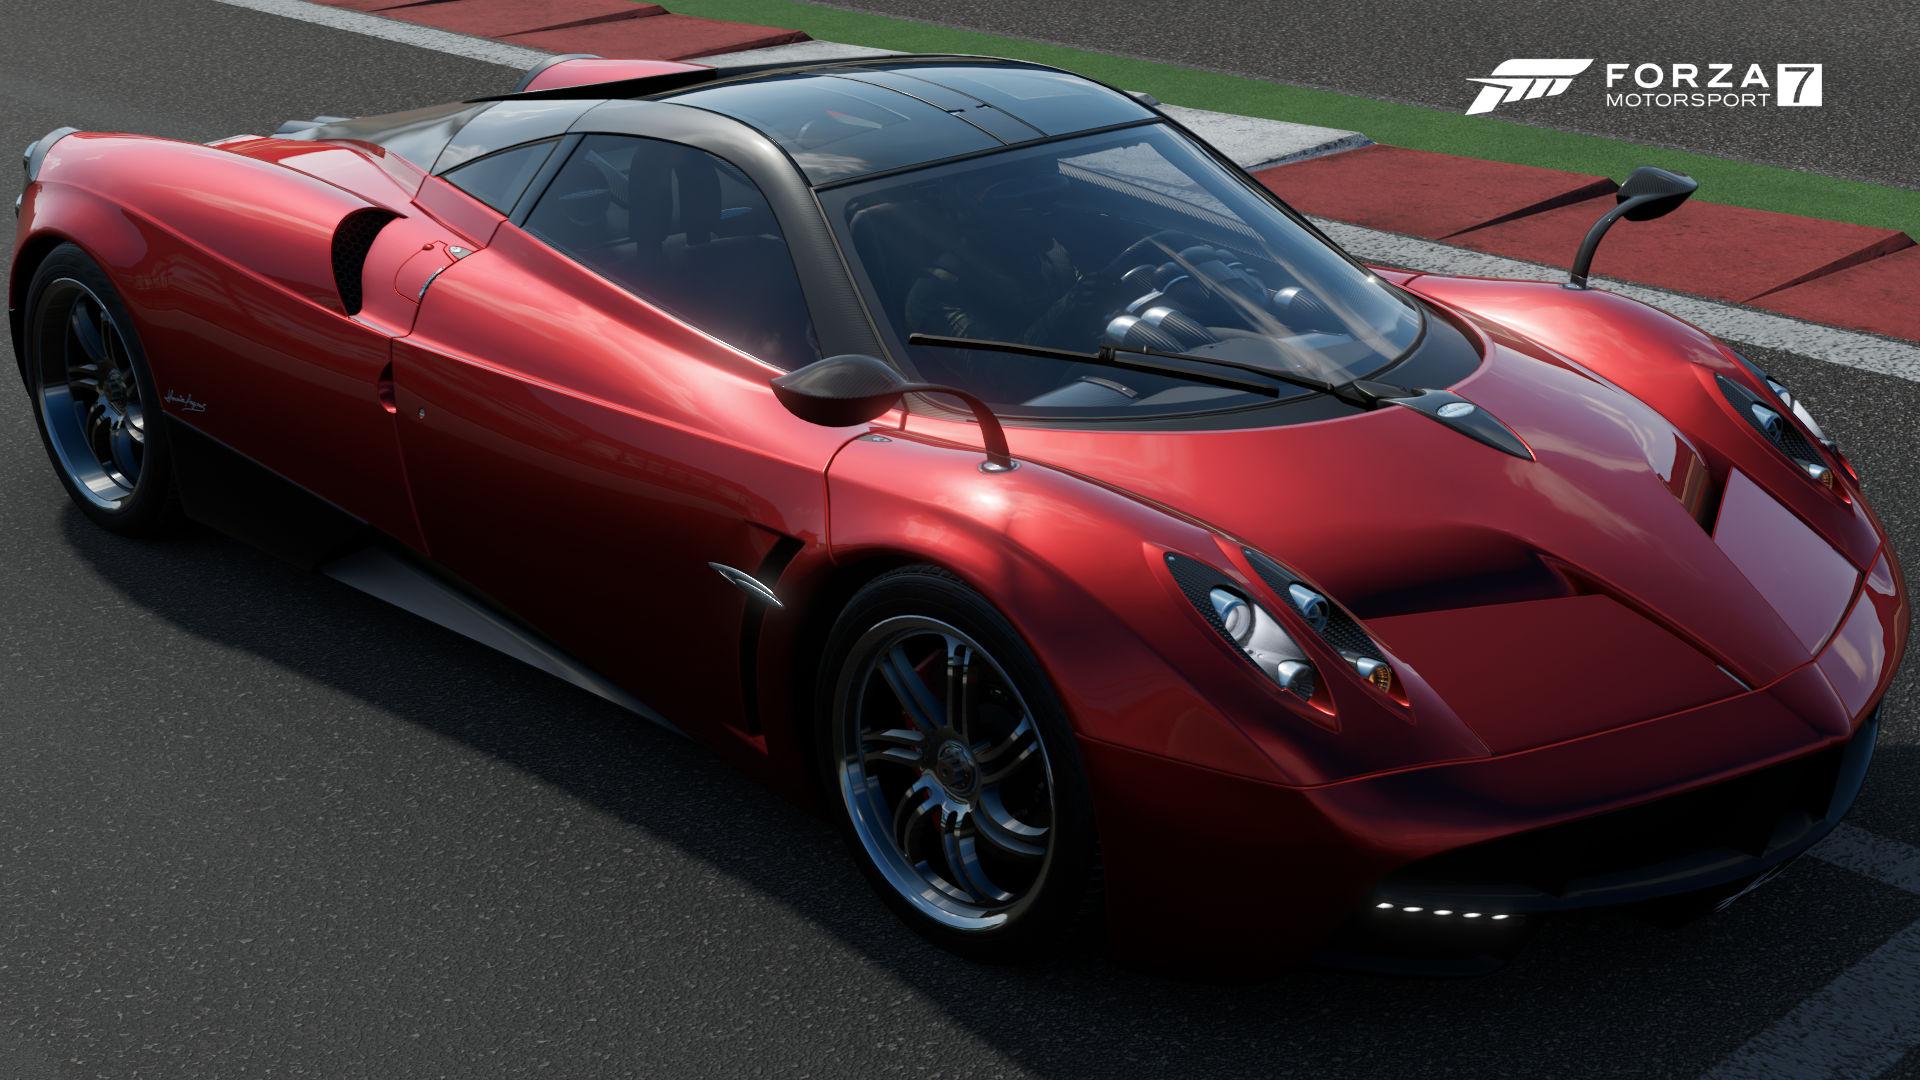 Pagani Huayra | Forza Motorsport Wiki | FANDOM powered by Wikia